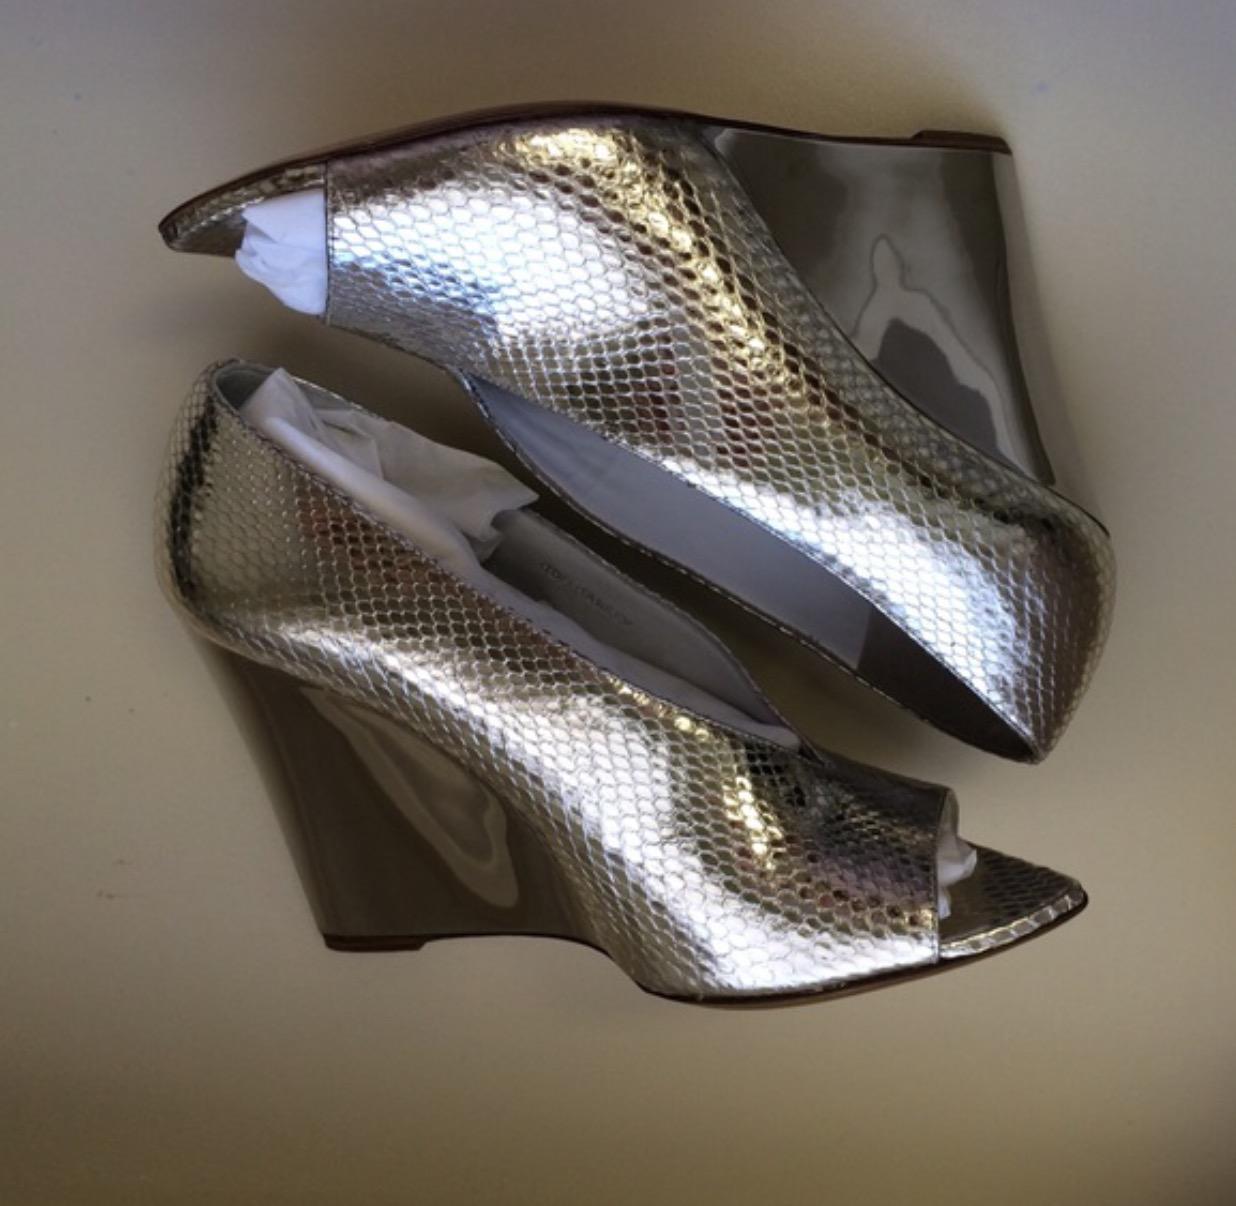 Burberry Prorsum silver wedges